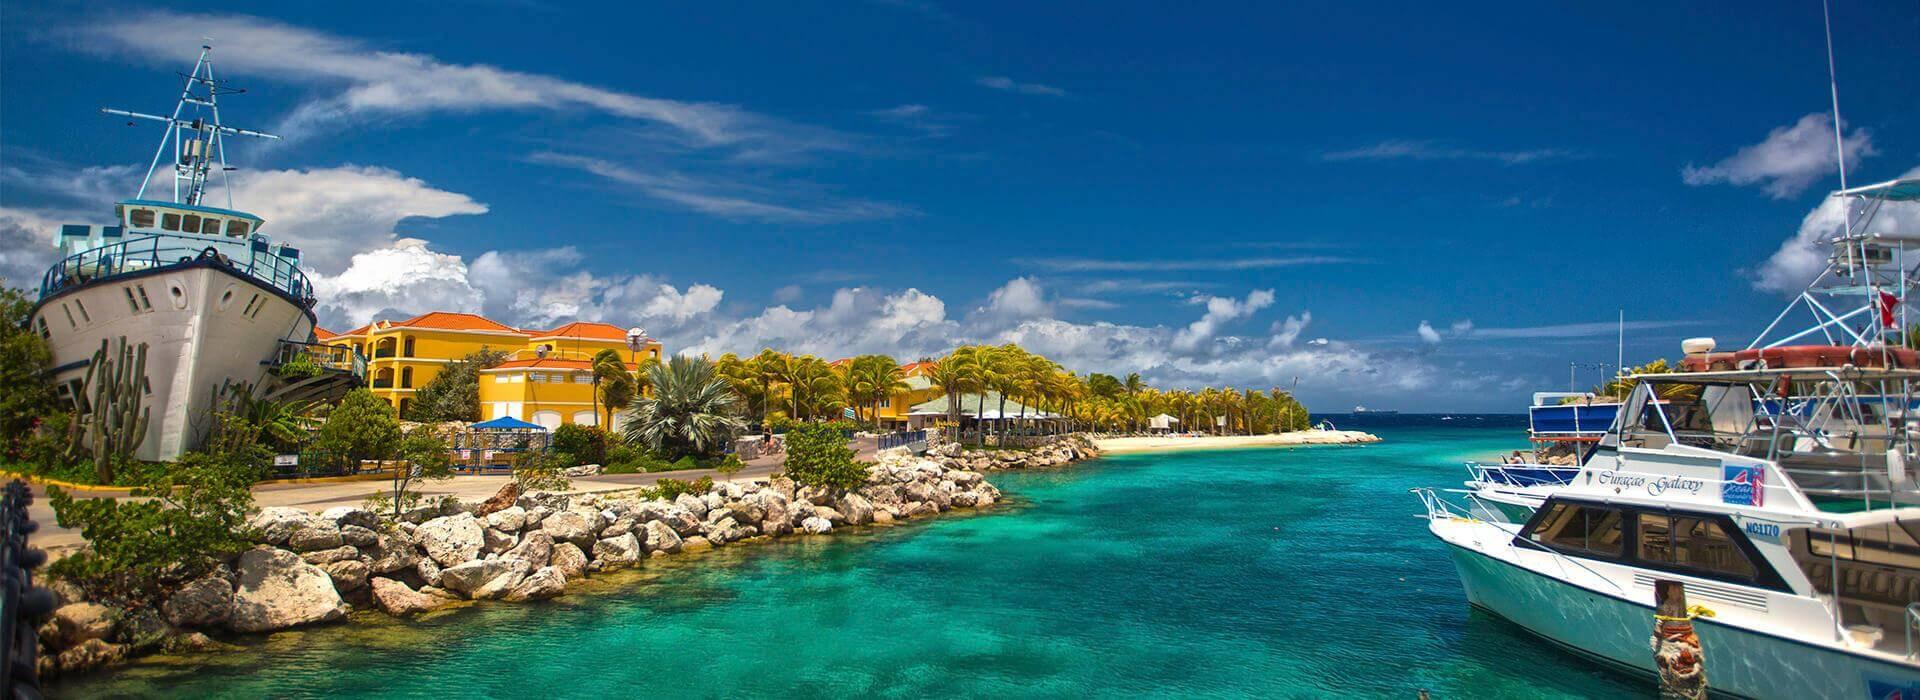 The Royal Sea Aquarium Resort Curacao Resort